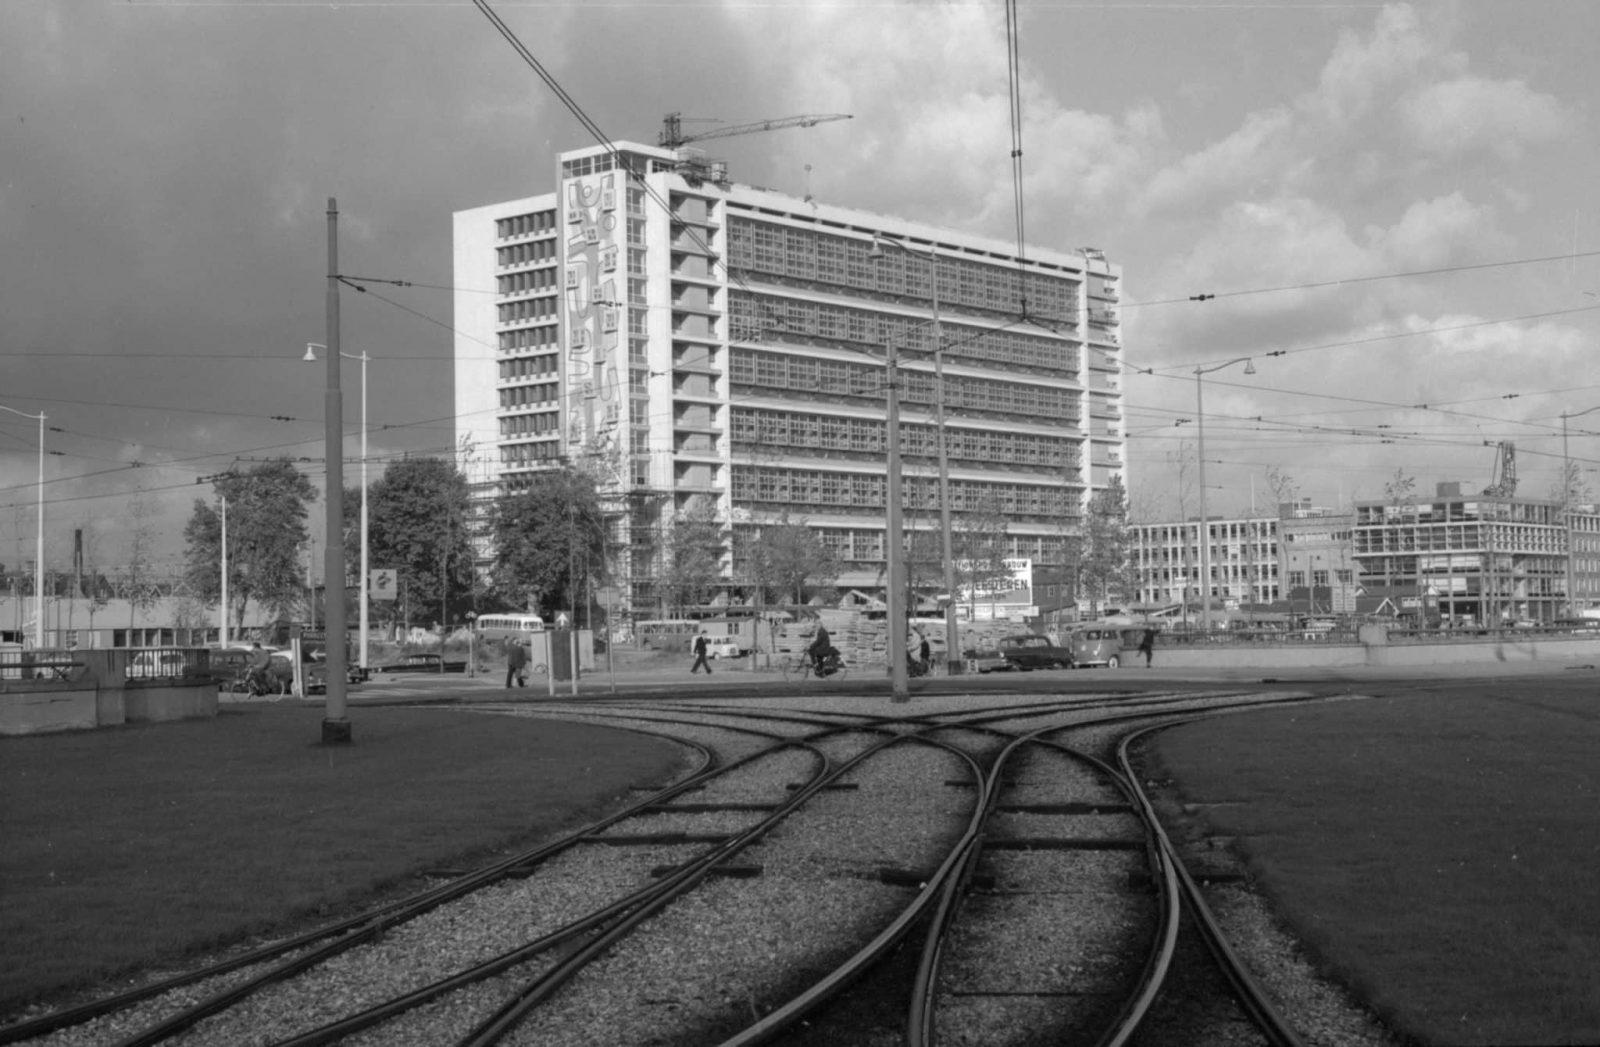 Stationsp 2 Nl Rtsa 4121 1887